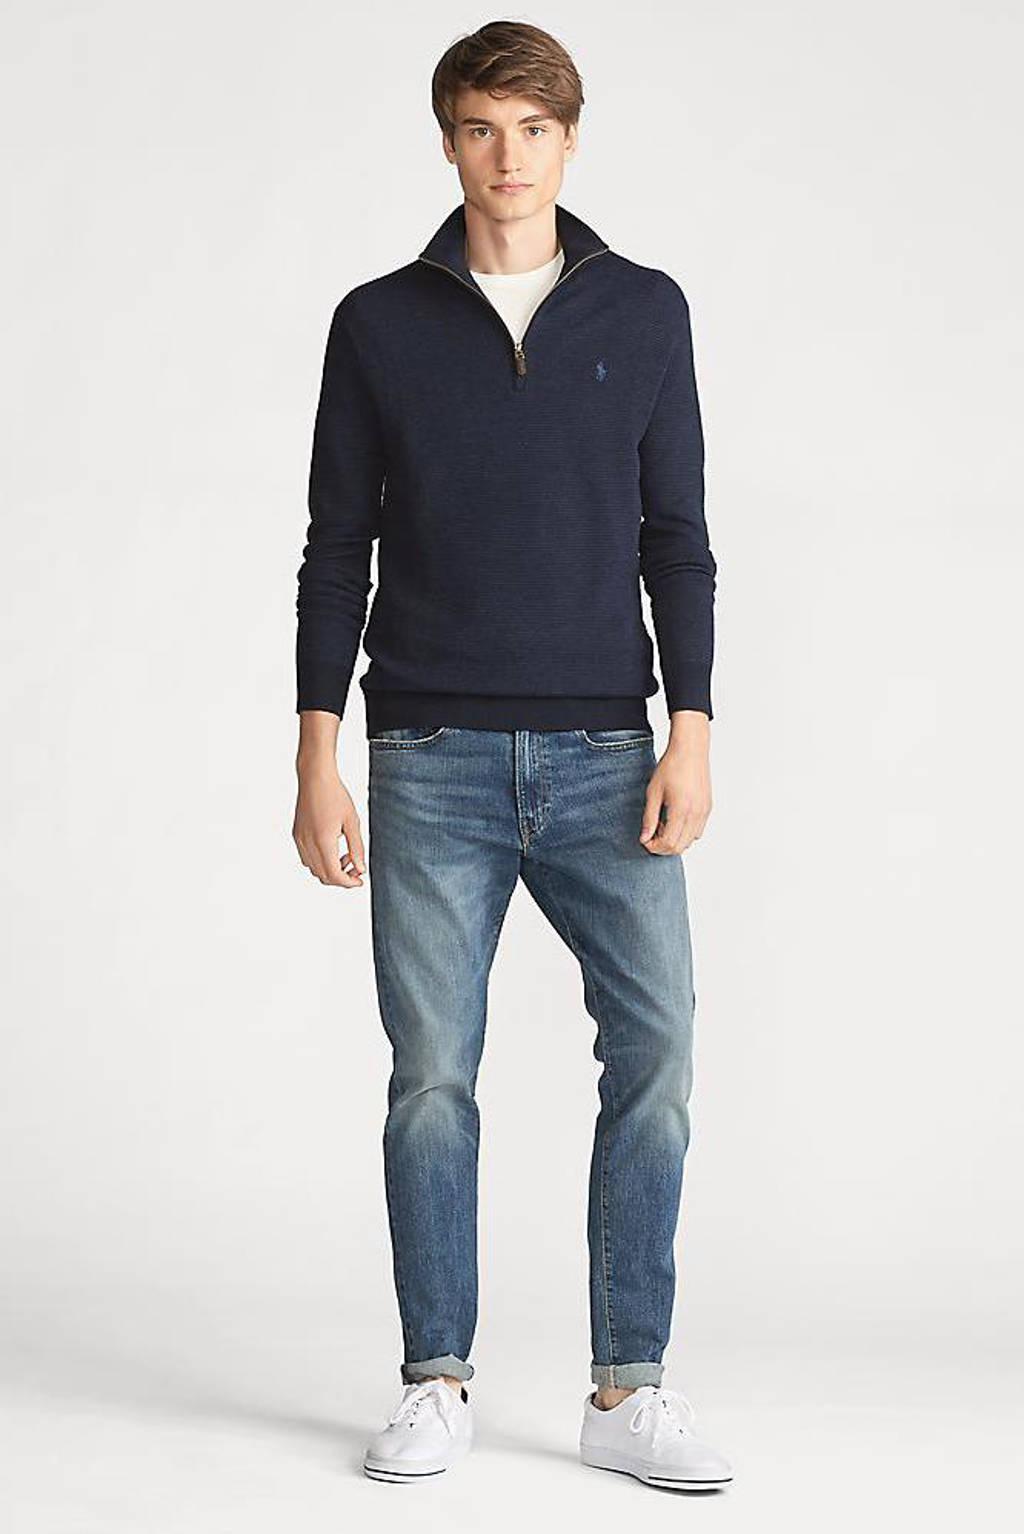 POLO Ralph Lauren wollen trui donkerblauw, Donkerblauw